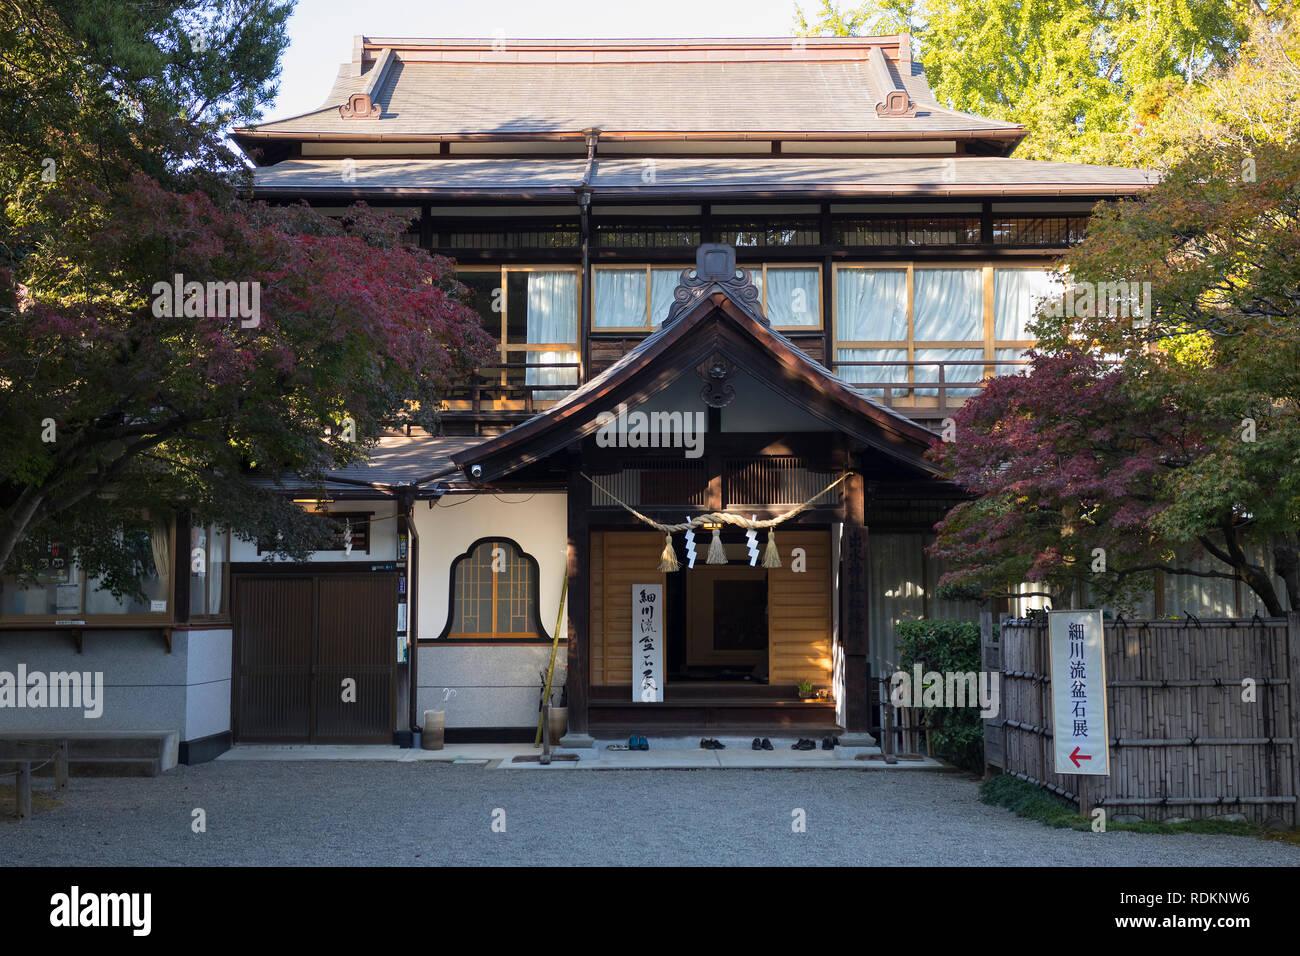 Kumamoto, Japan - November 11, 2018: Entrance to the exhibition hall in Suizenji Garden - Stock Image